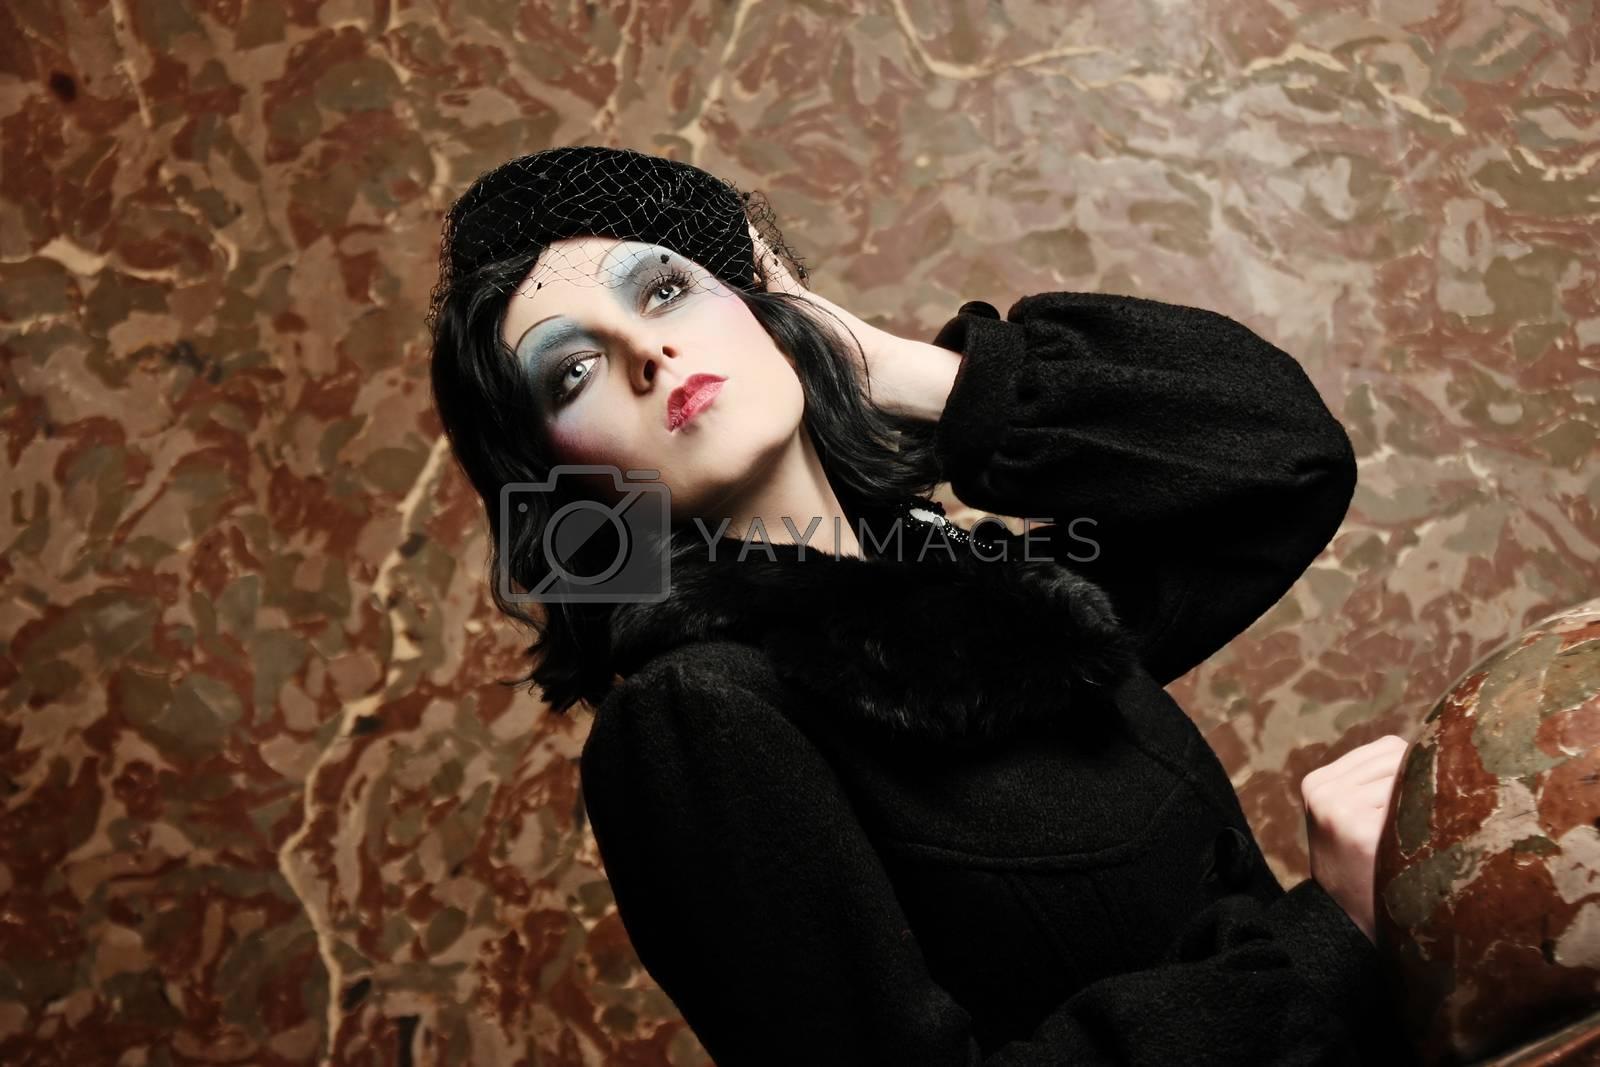 Fashion by Aarstudio